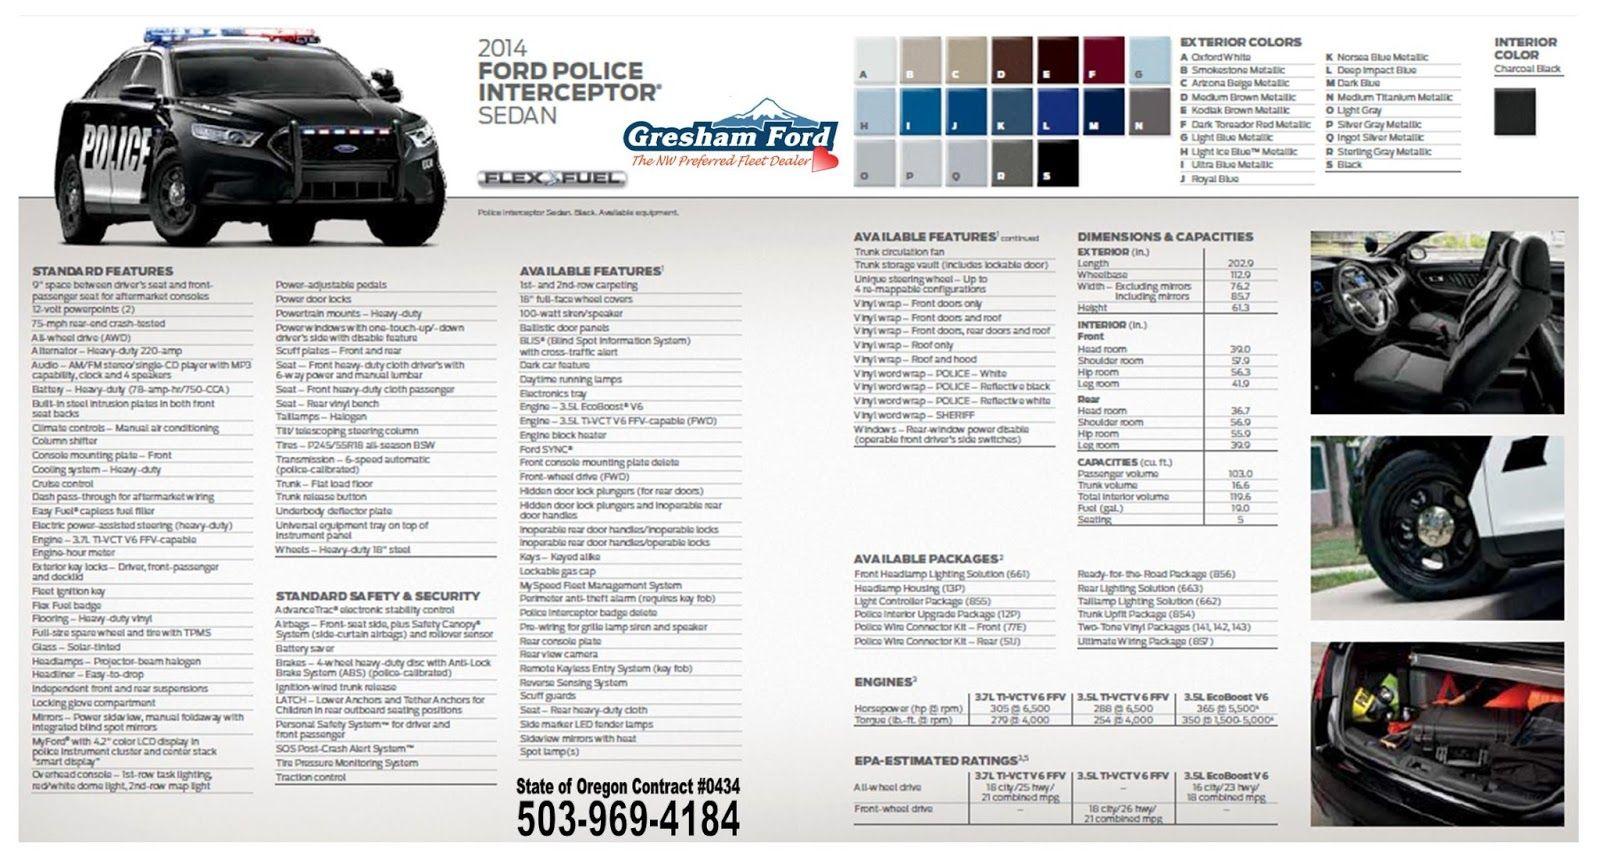 2014 Ford Police Interceptor Sedan Standard And Available Options Sheet Ford Police Interceptor Police